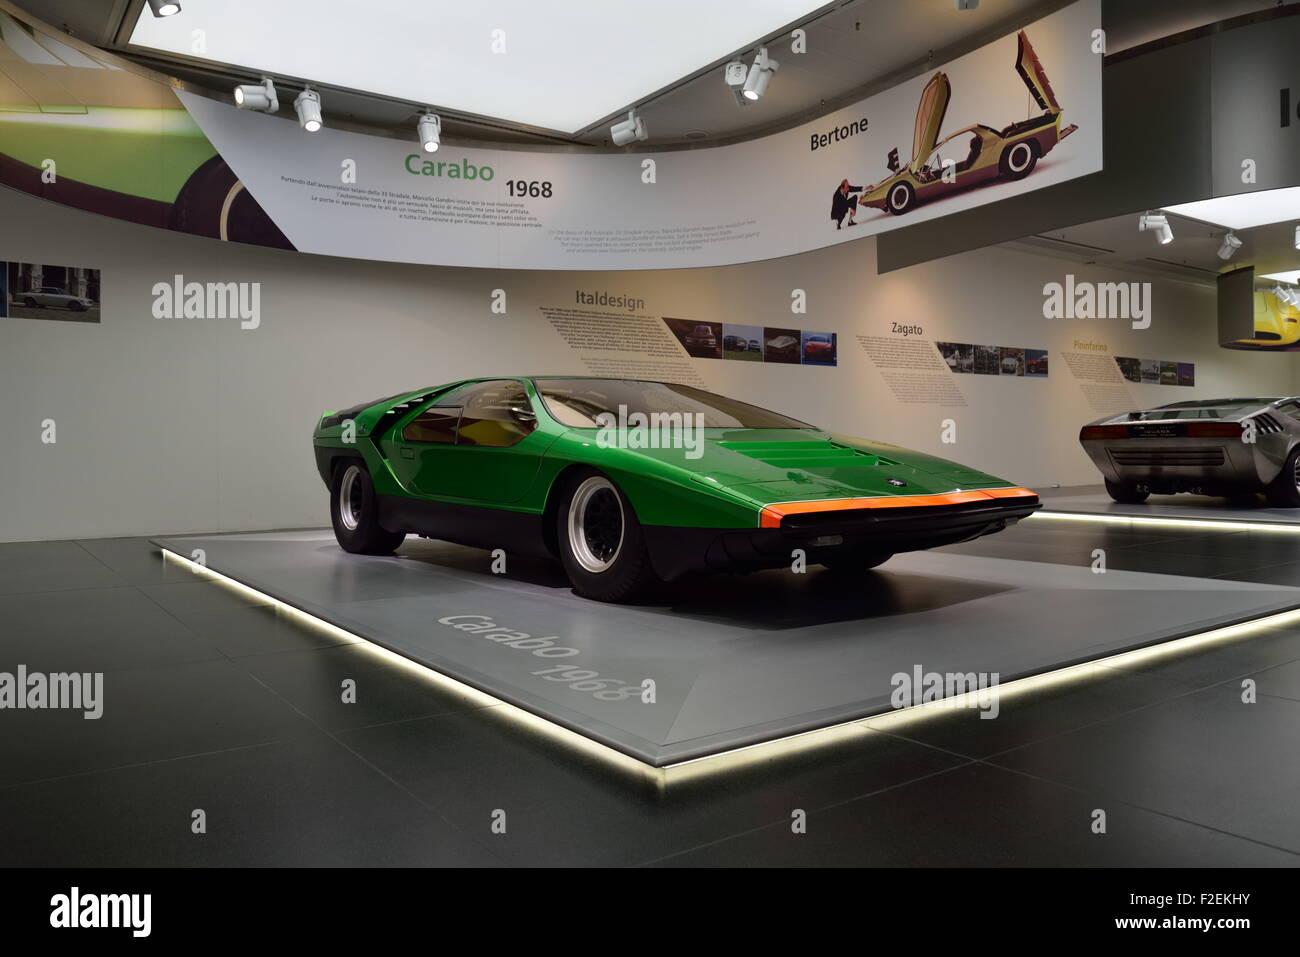 1968 alfa romeo bertone carabo konzept im alfa-romeo-museum in arese